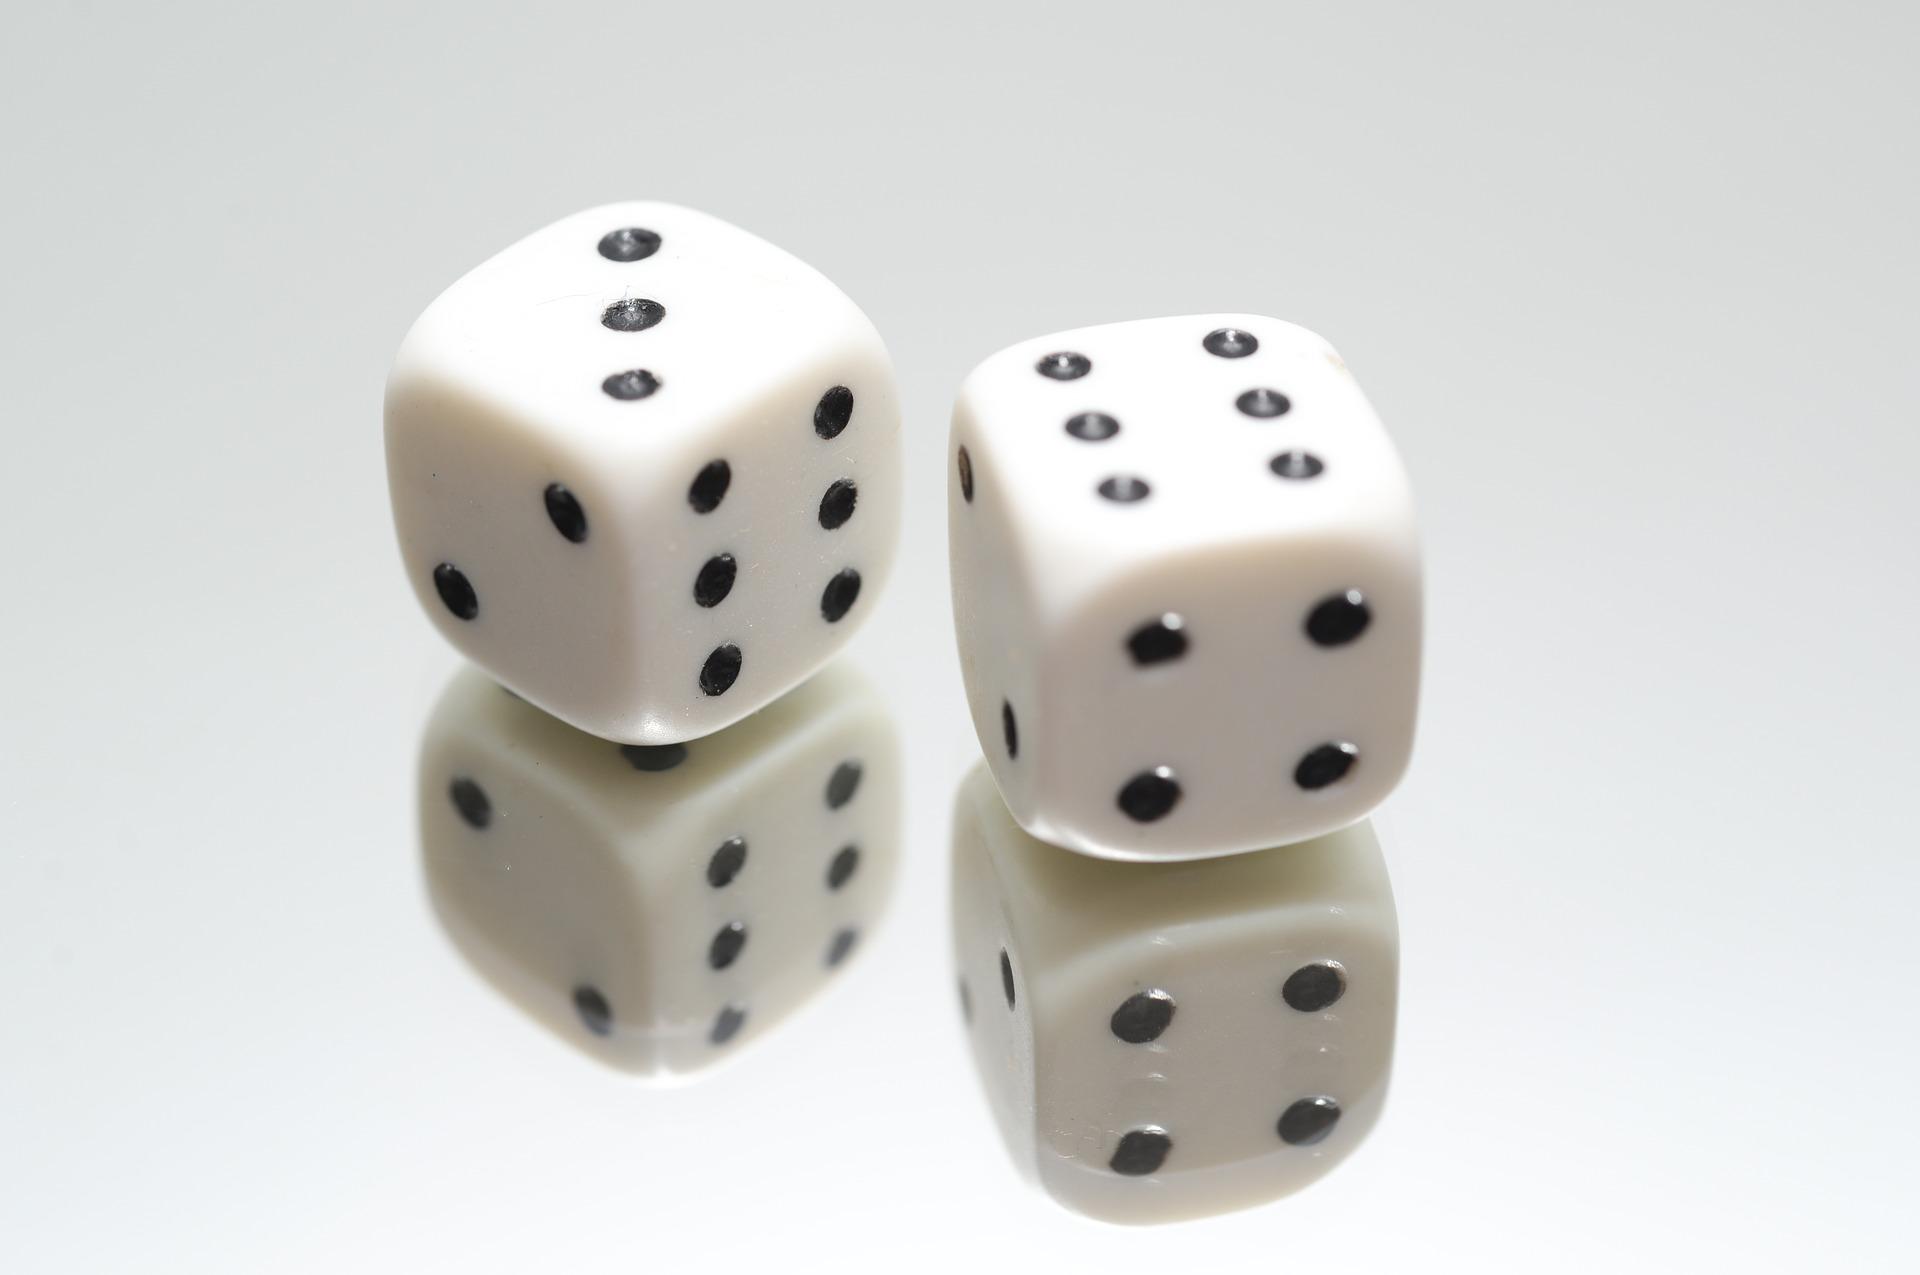 dice (three and six)